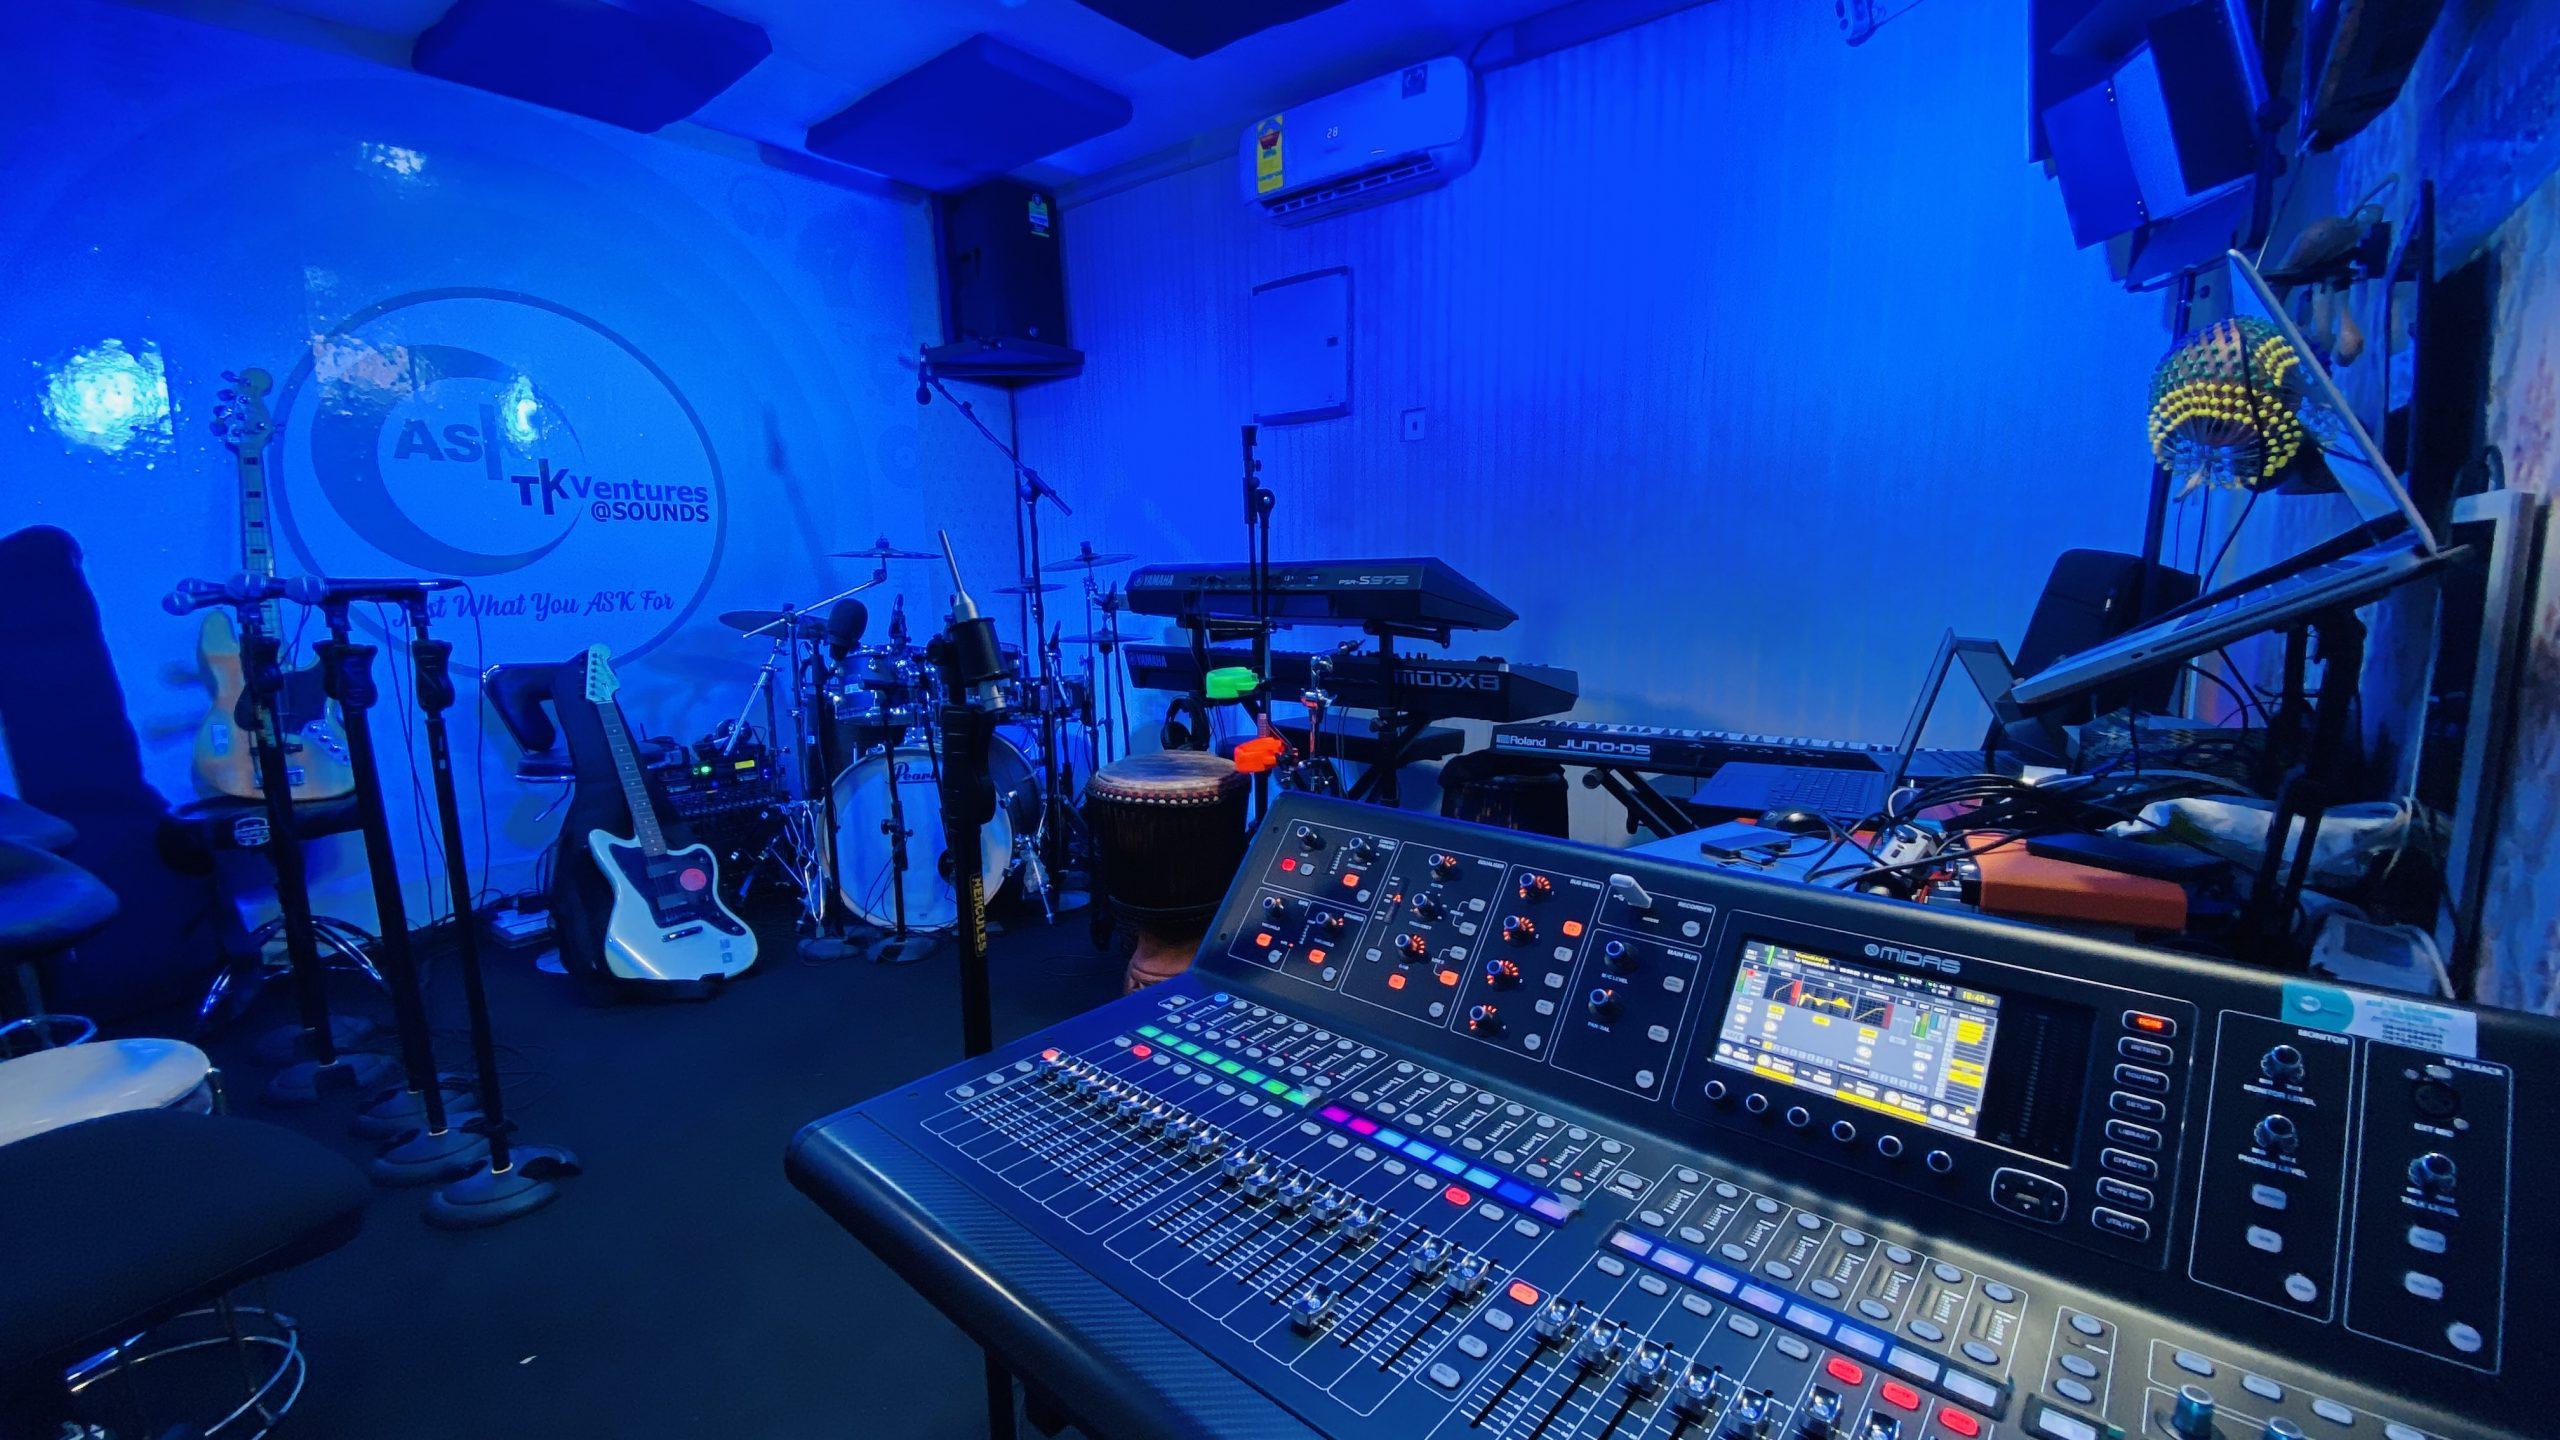 ASK-TK Studio